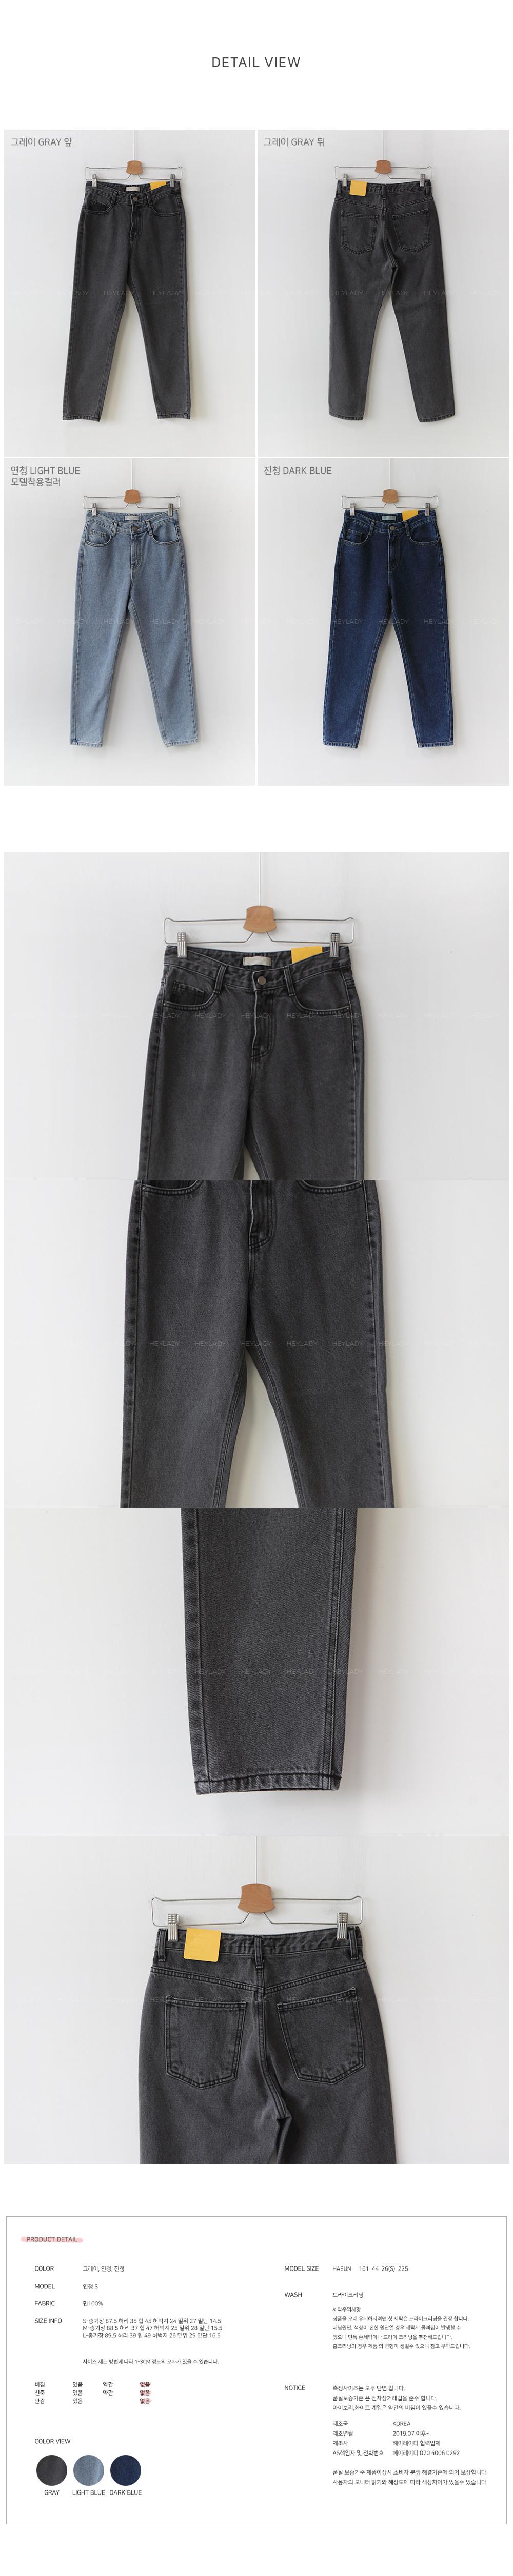 Sanderine Denim Pants